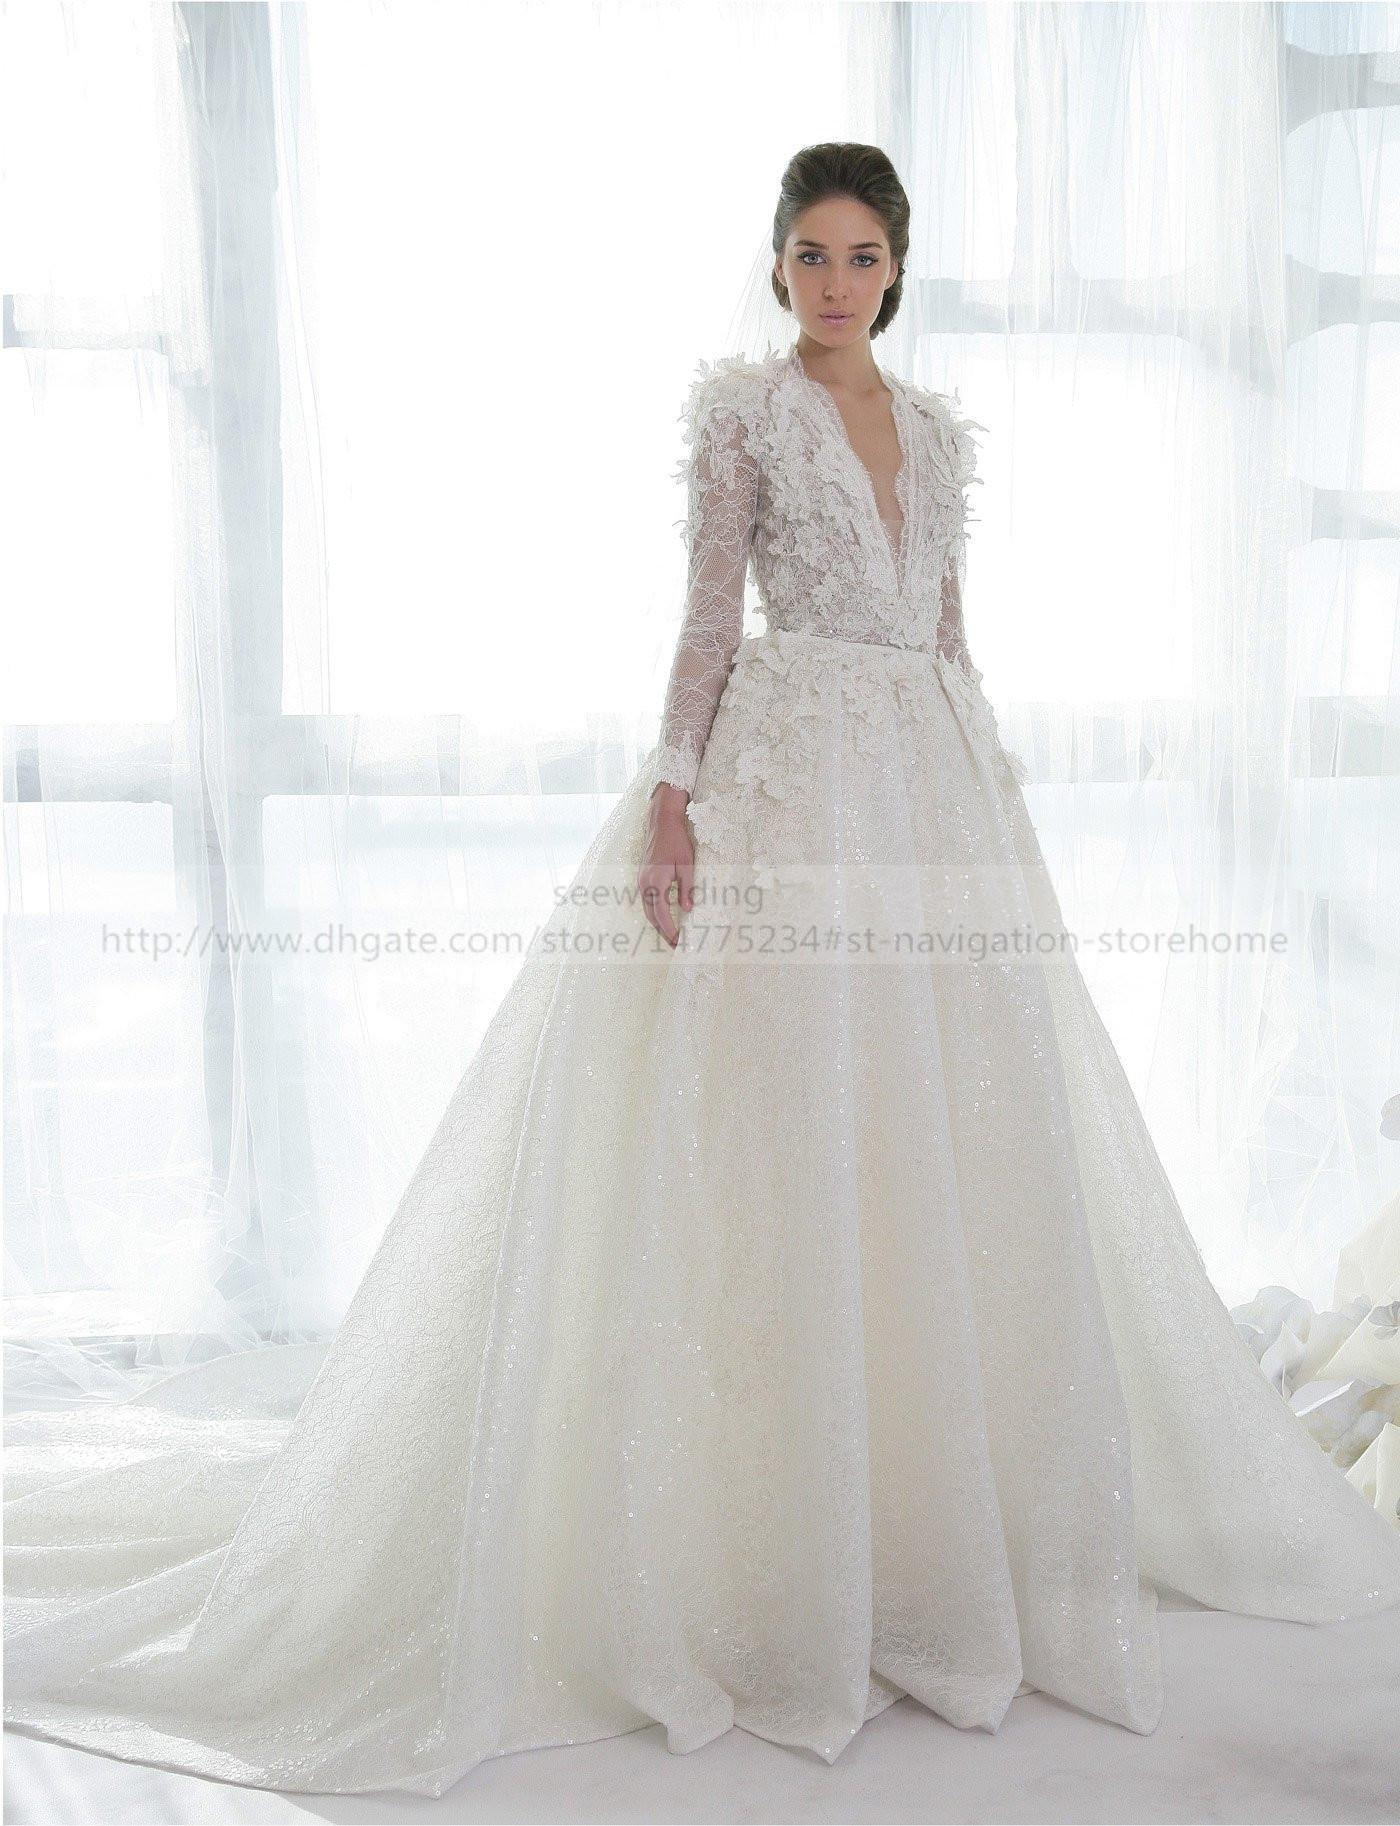 Lebanon Designer Ziad Nakad Wedding Dresses V Neck Floral Lace ...